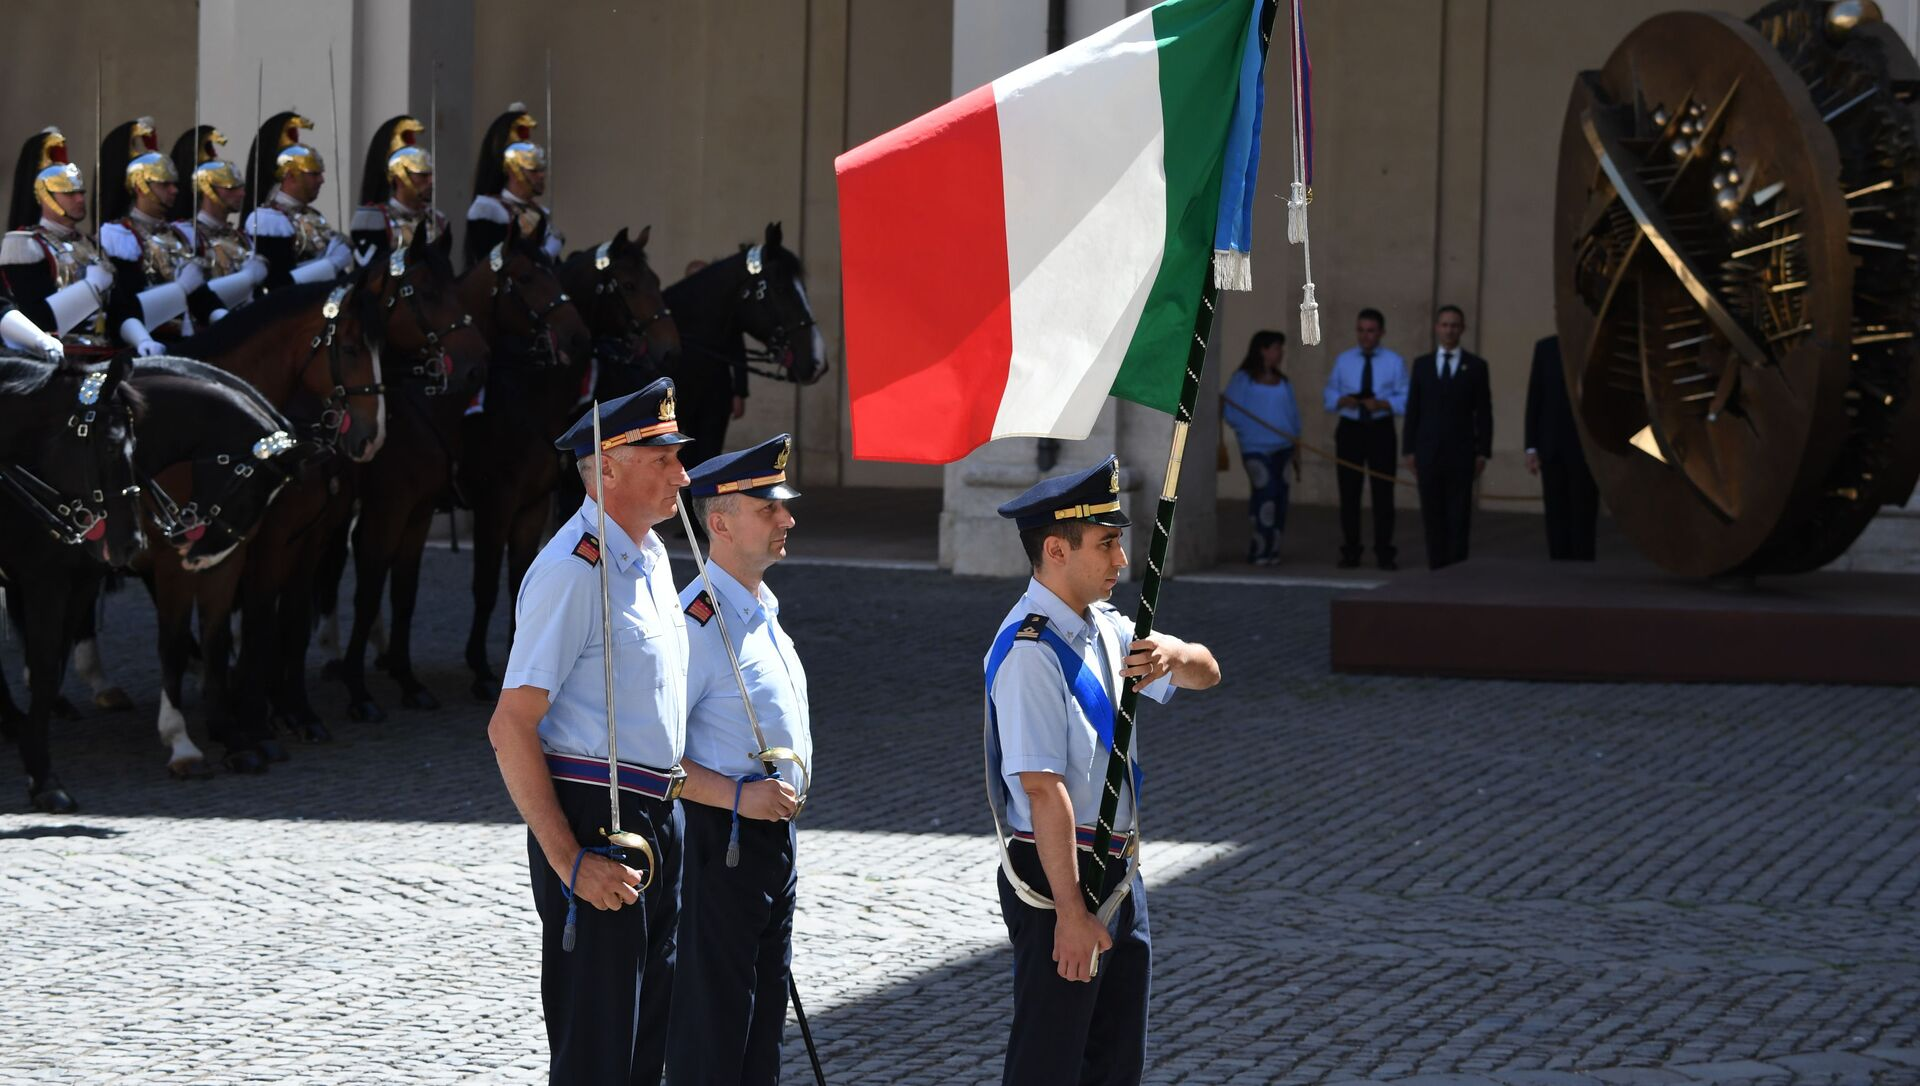 Bandiera italiana - Sputnik Italia, 1920, 22.02.2021